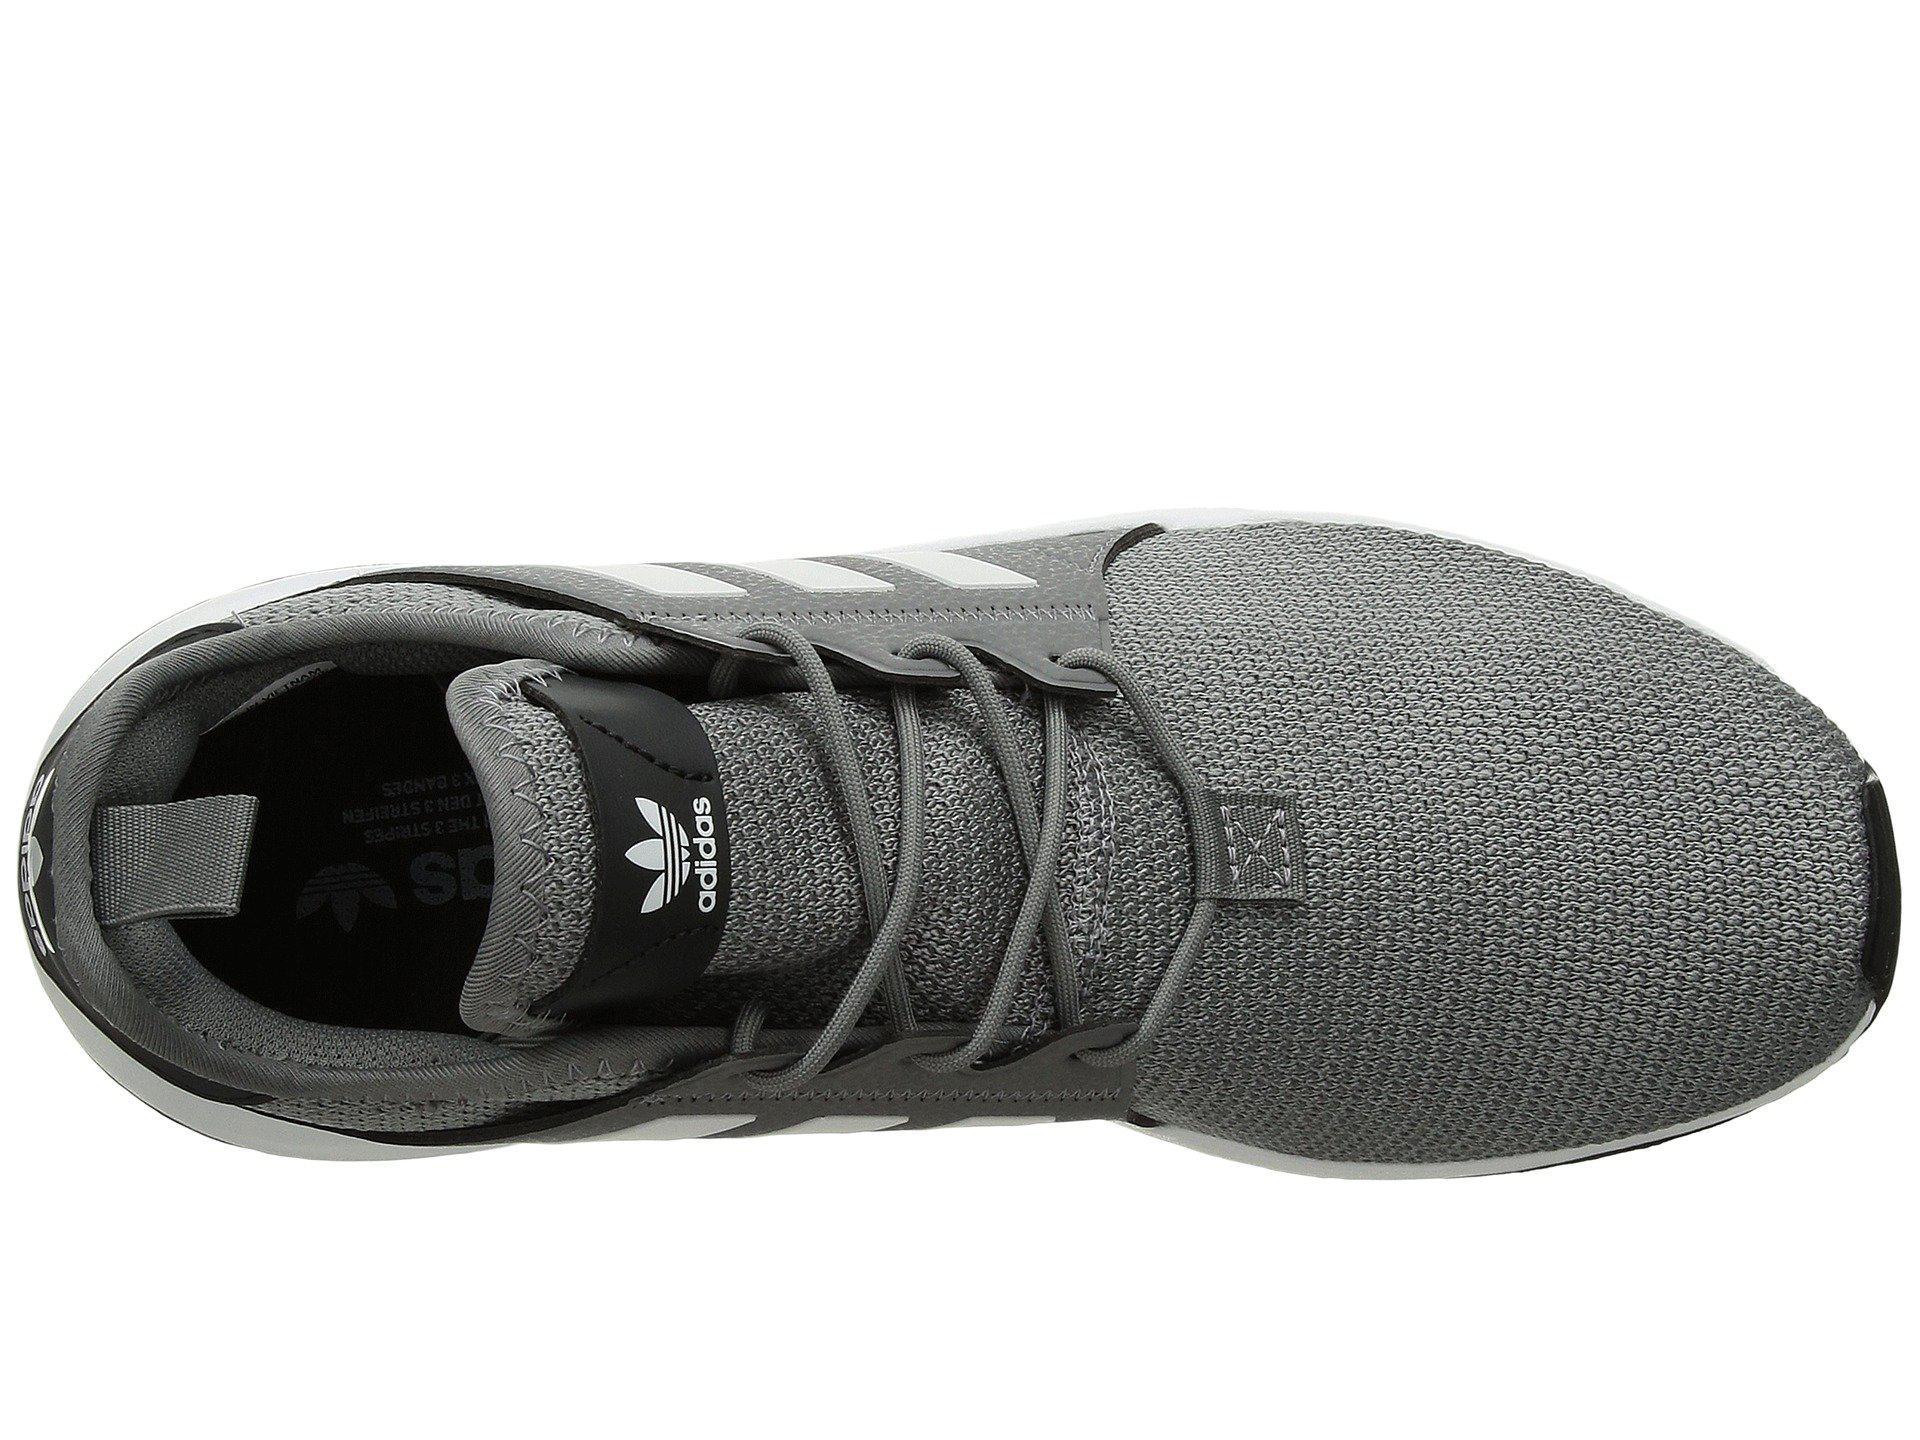 c883b2888e78 Lyst - adidas Originals X Plr (grey Three white carbon) Men s Shoes ...